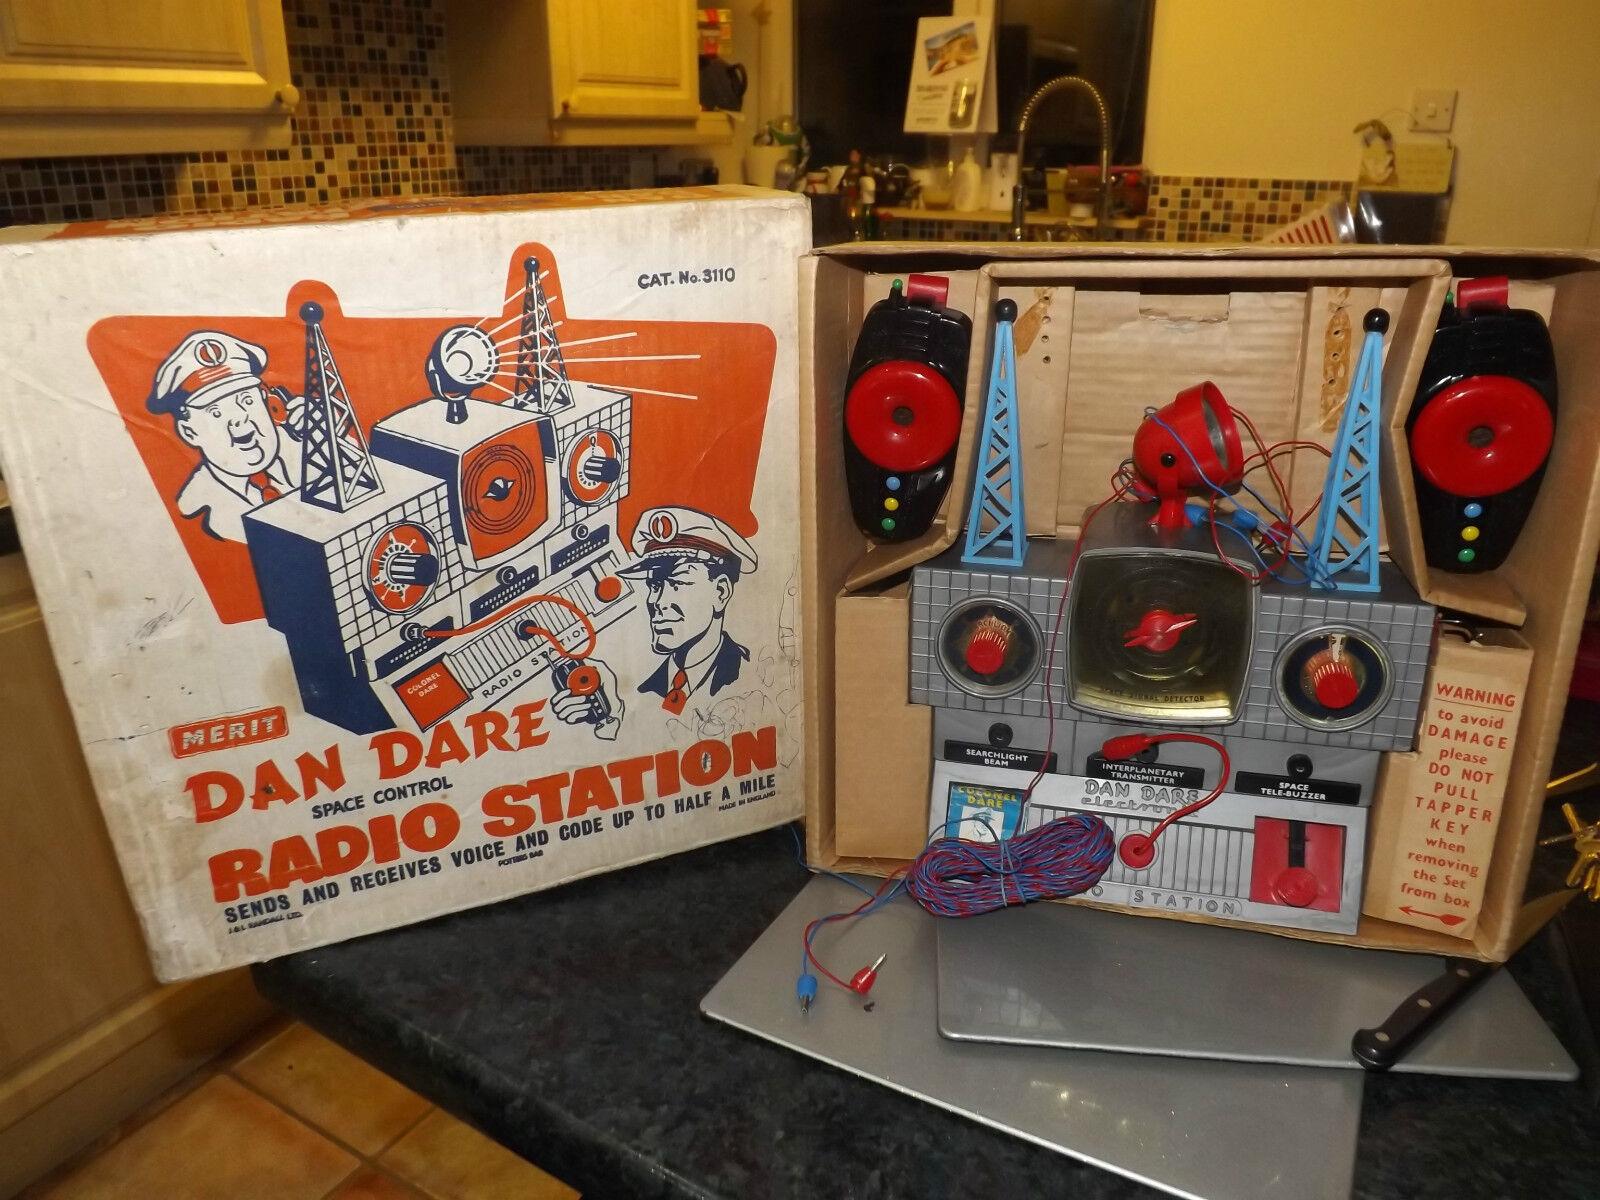 Vintage merit  Dan Dare Space Control Radio Station mint j & l randall and co